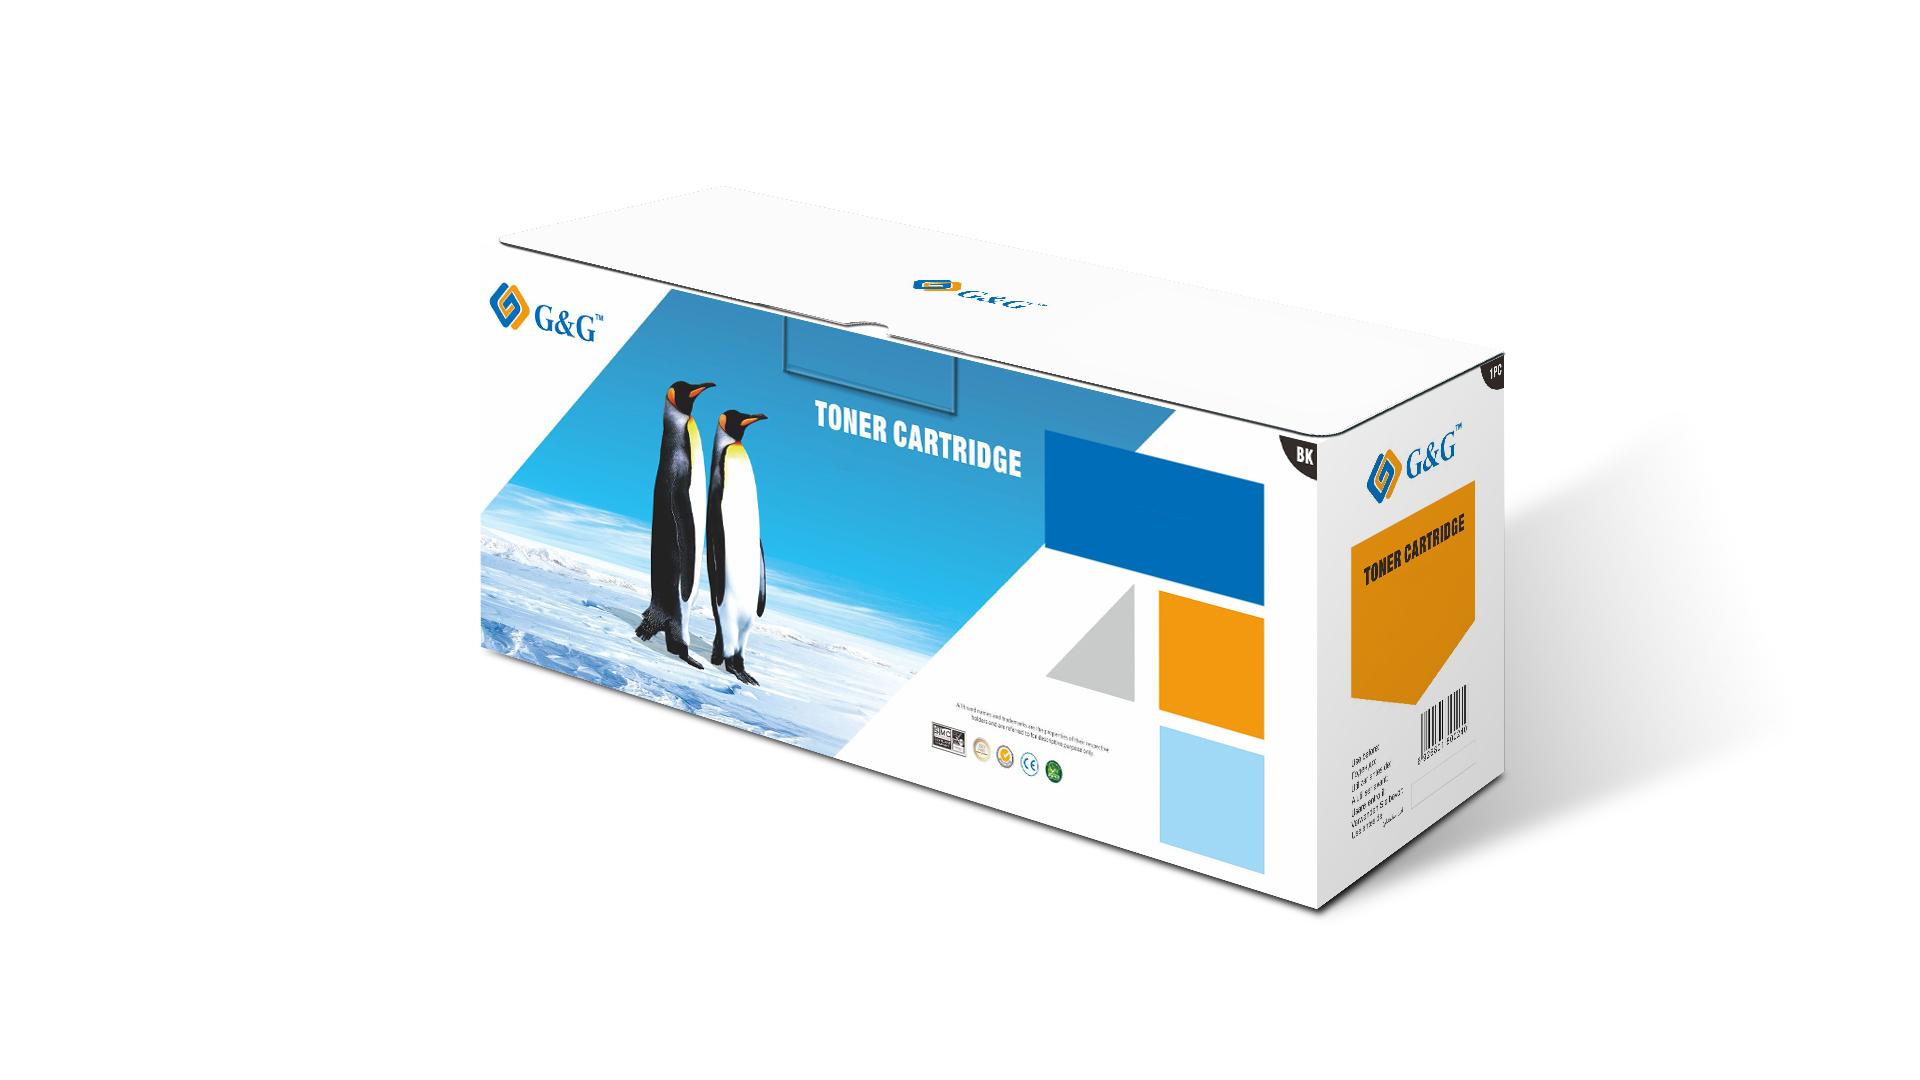 Compatible G&G Kyocera TK3100/TK3110/TK3130 toner negro - Reemplaza 1T02MS0NL0/1T02MT0NL0/1T02MT0NLV/1T02MT0NLS/1T02LV0NL0